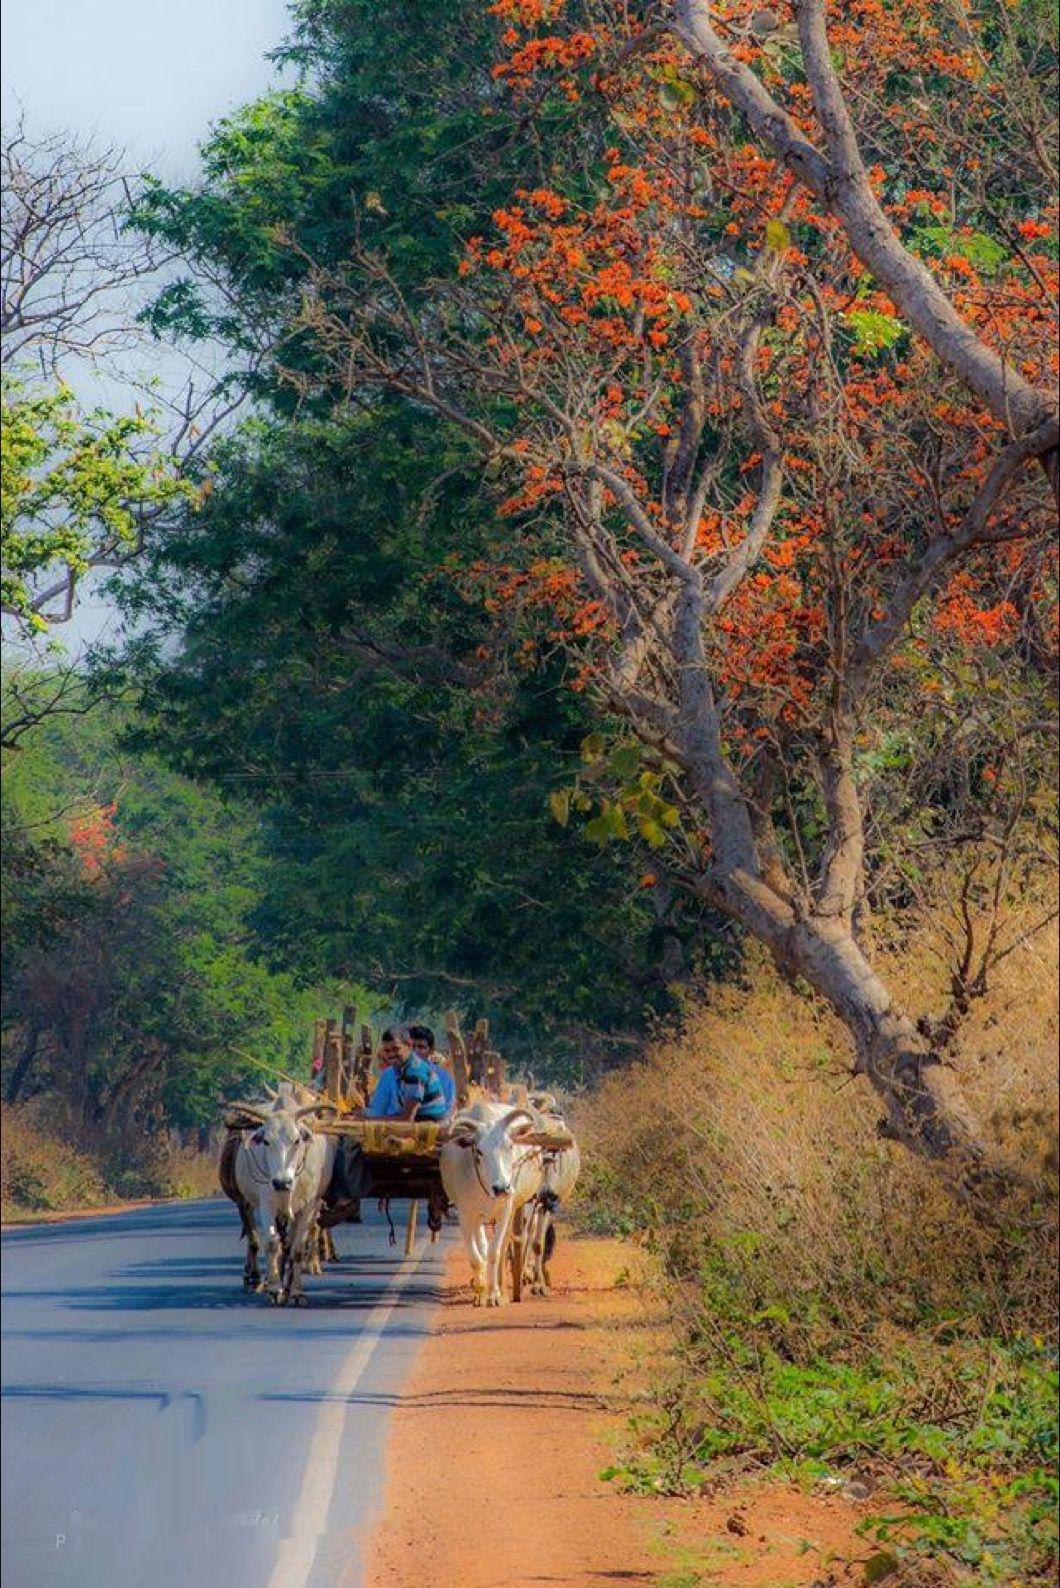 India S Hinterland Village Photography India Photography Nature Photography